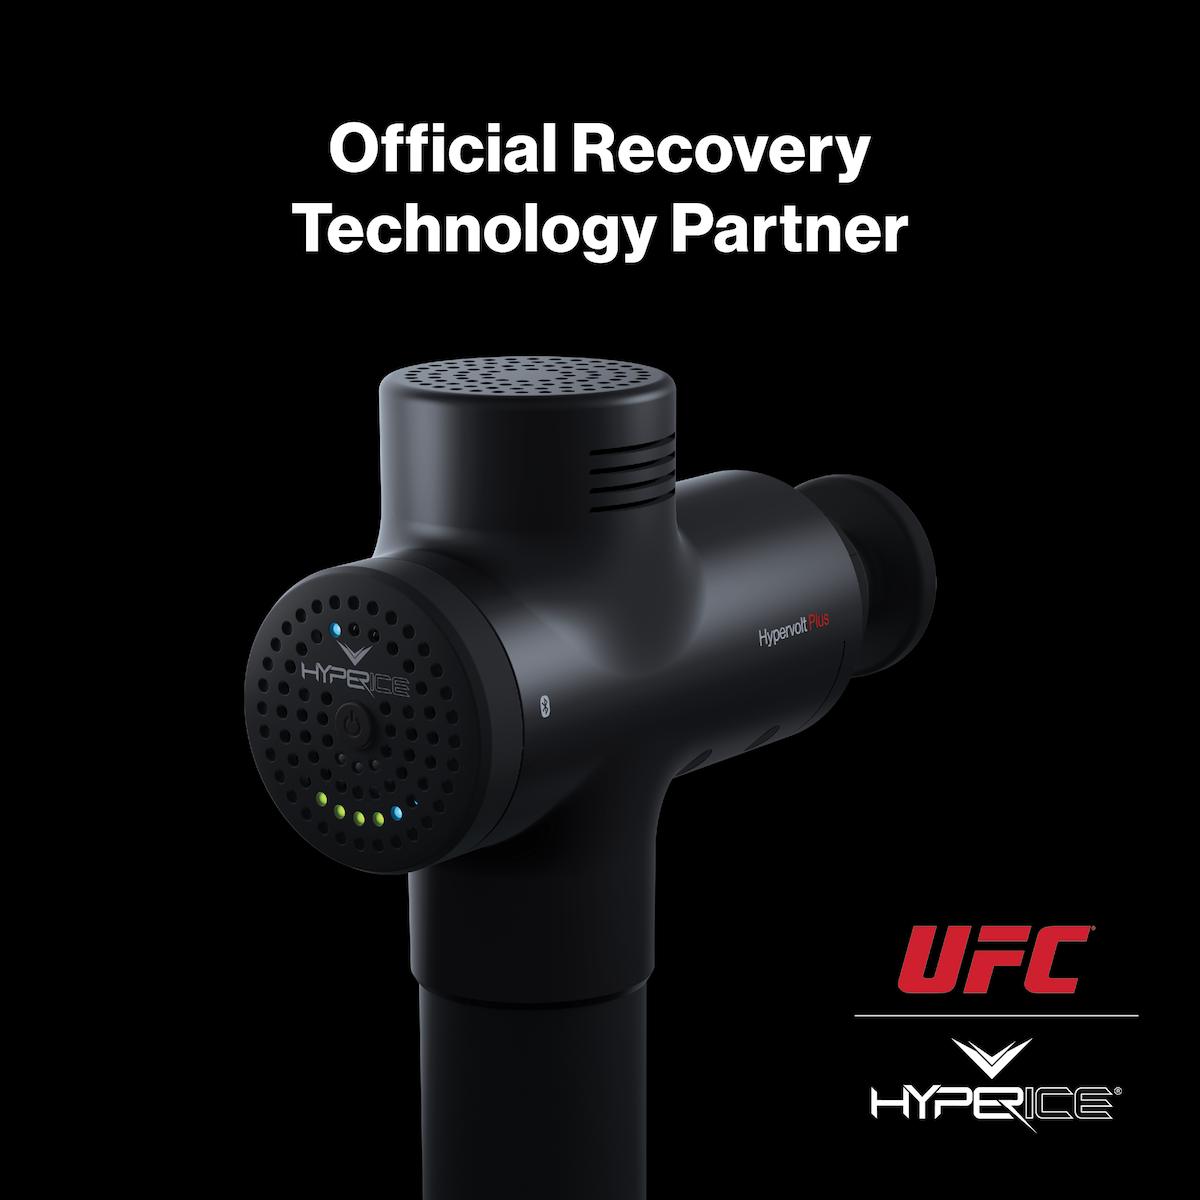 Hyperice成为UFC官方训练恢复科技合作伙伴